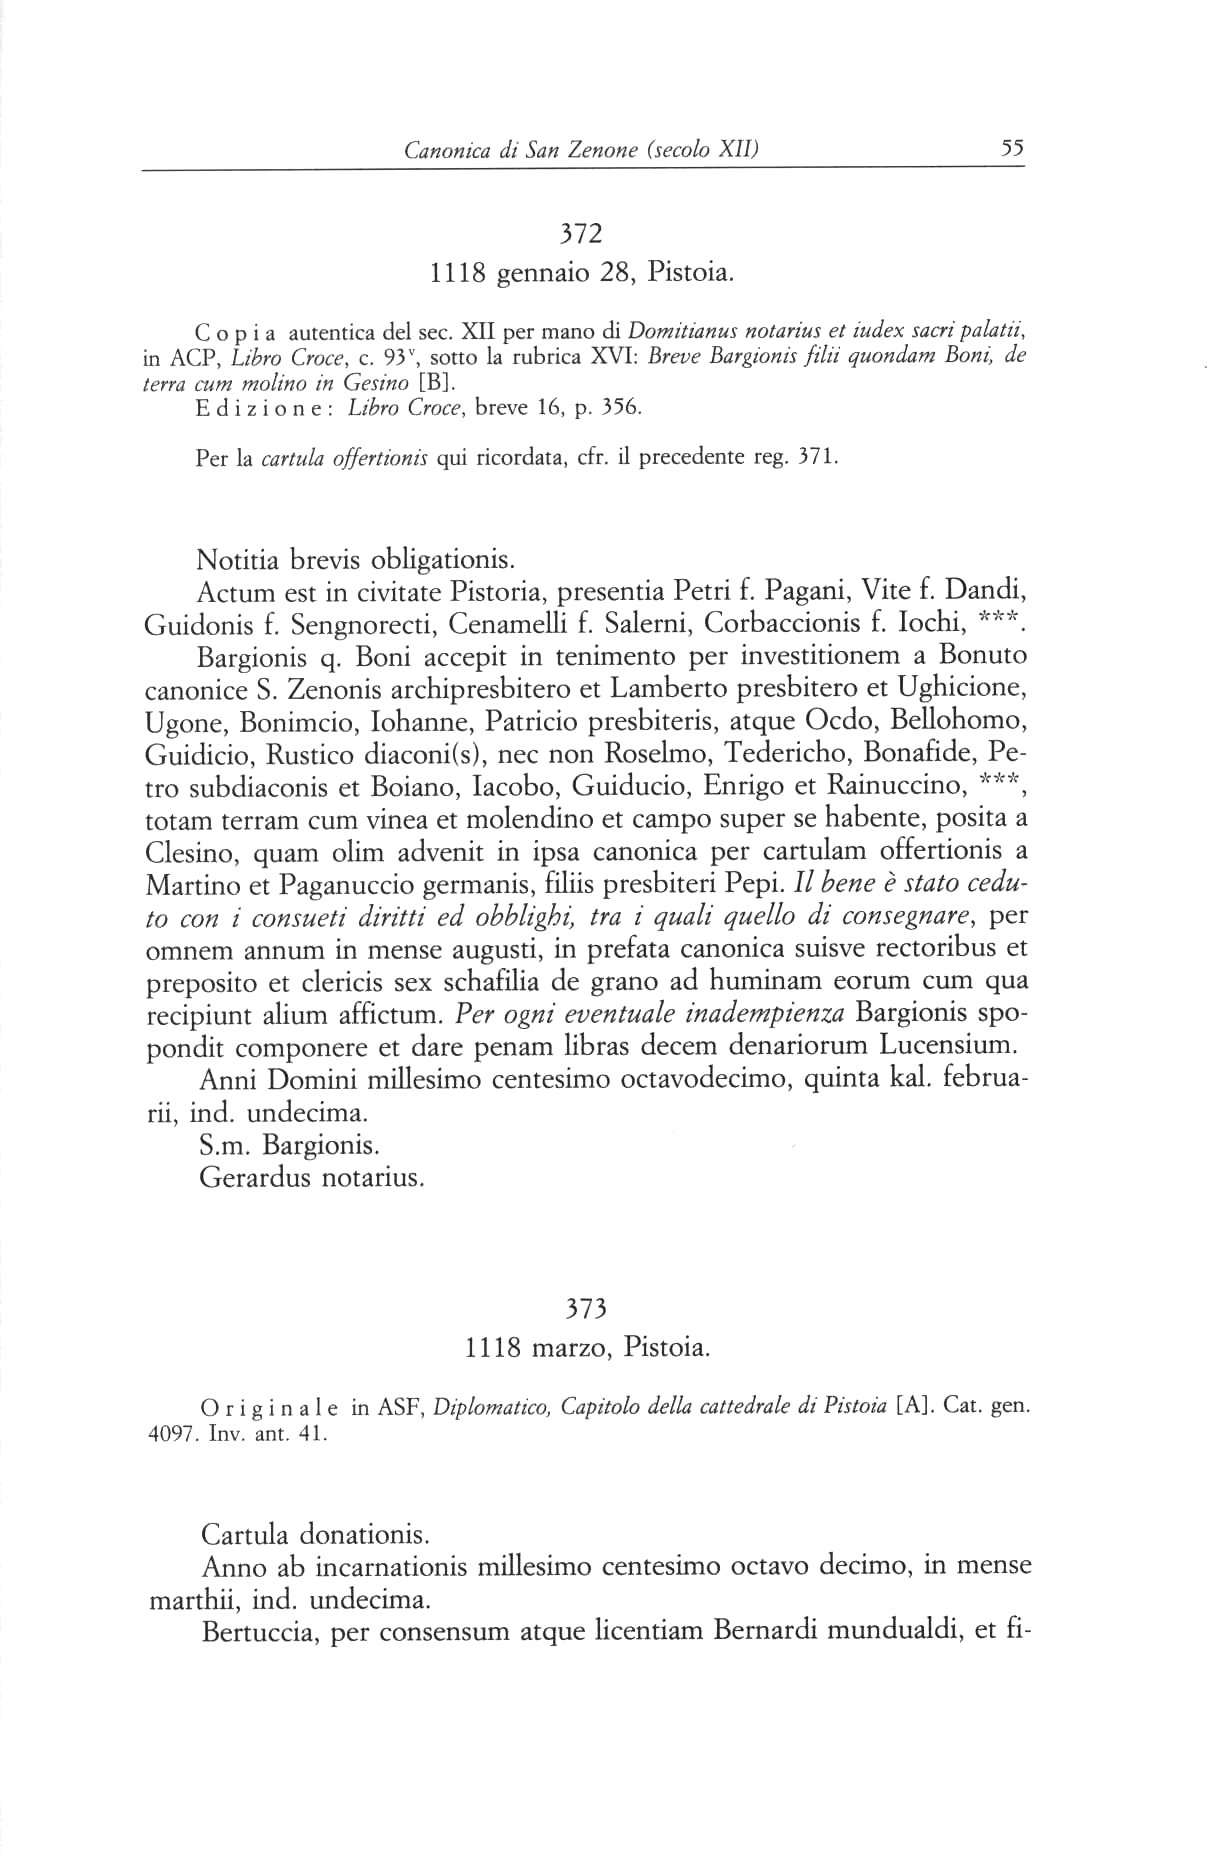 Canonica S. Zenone XII 0055.jpg